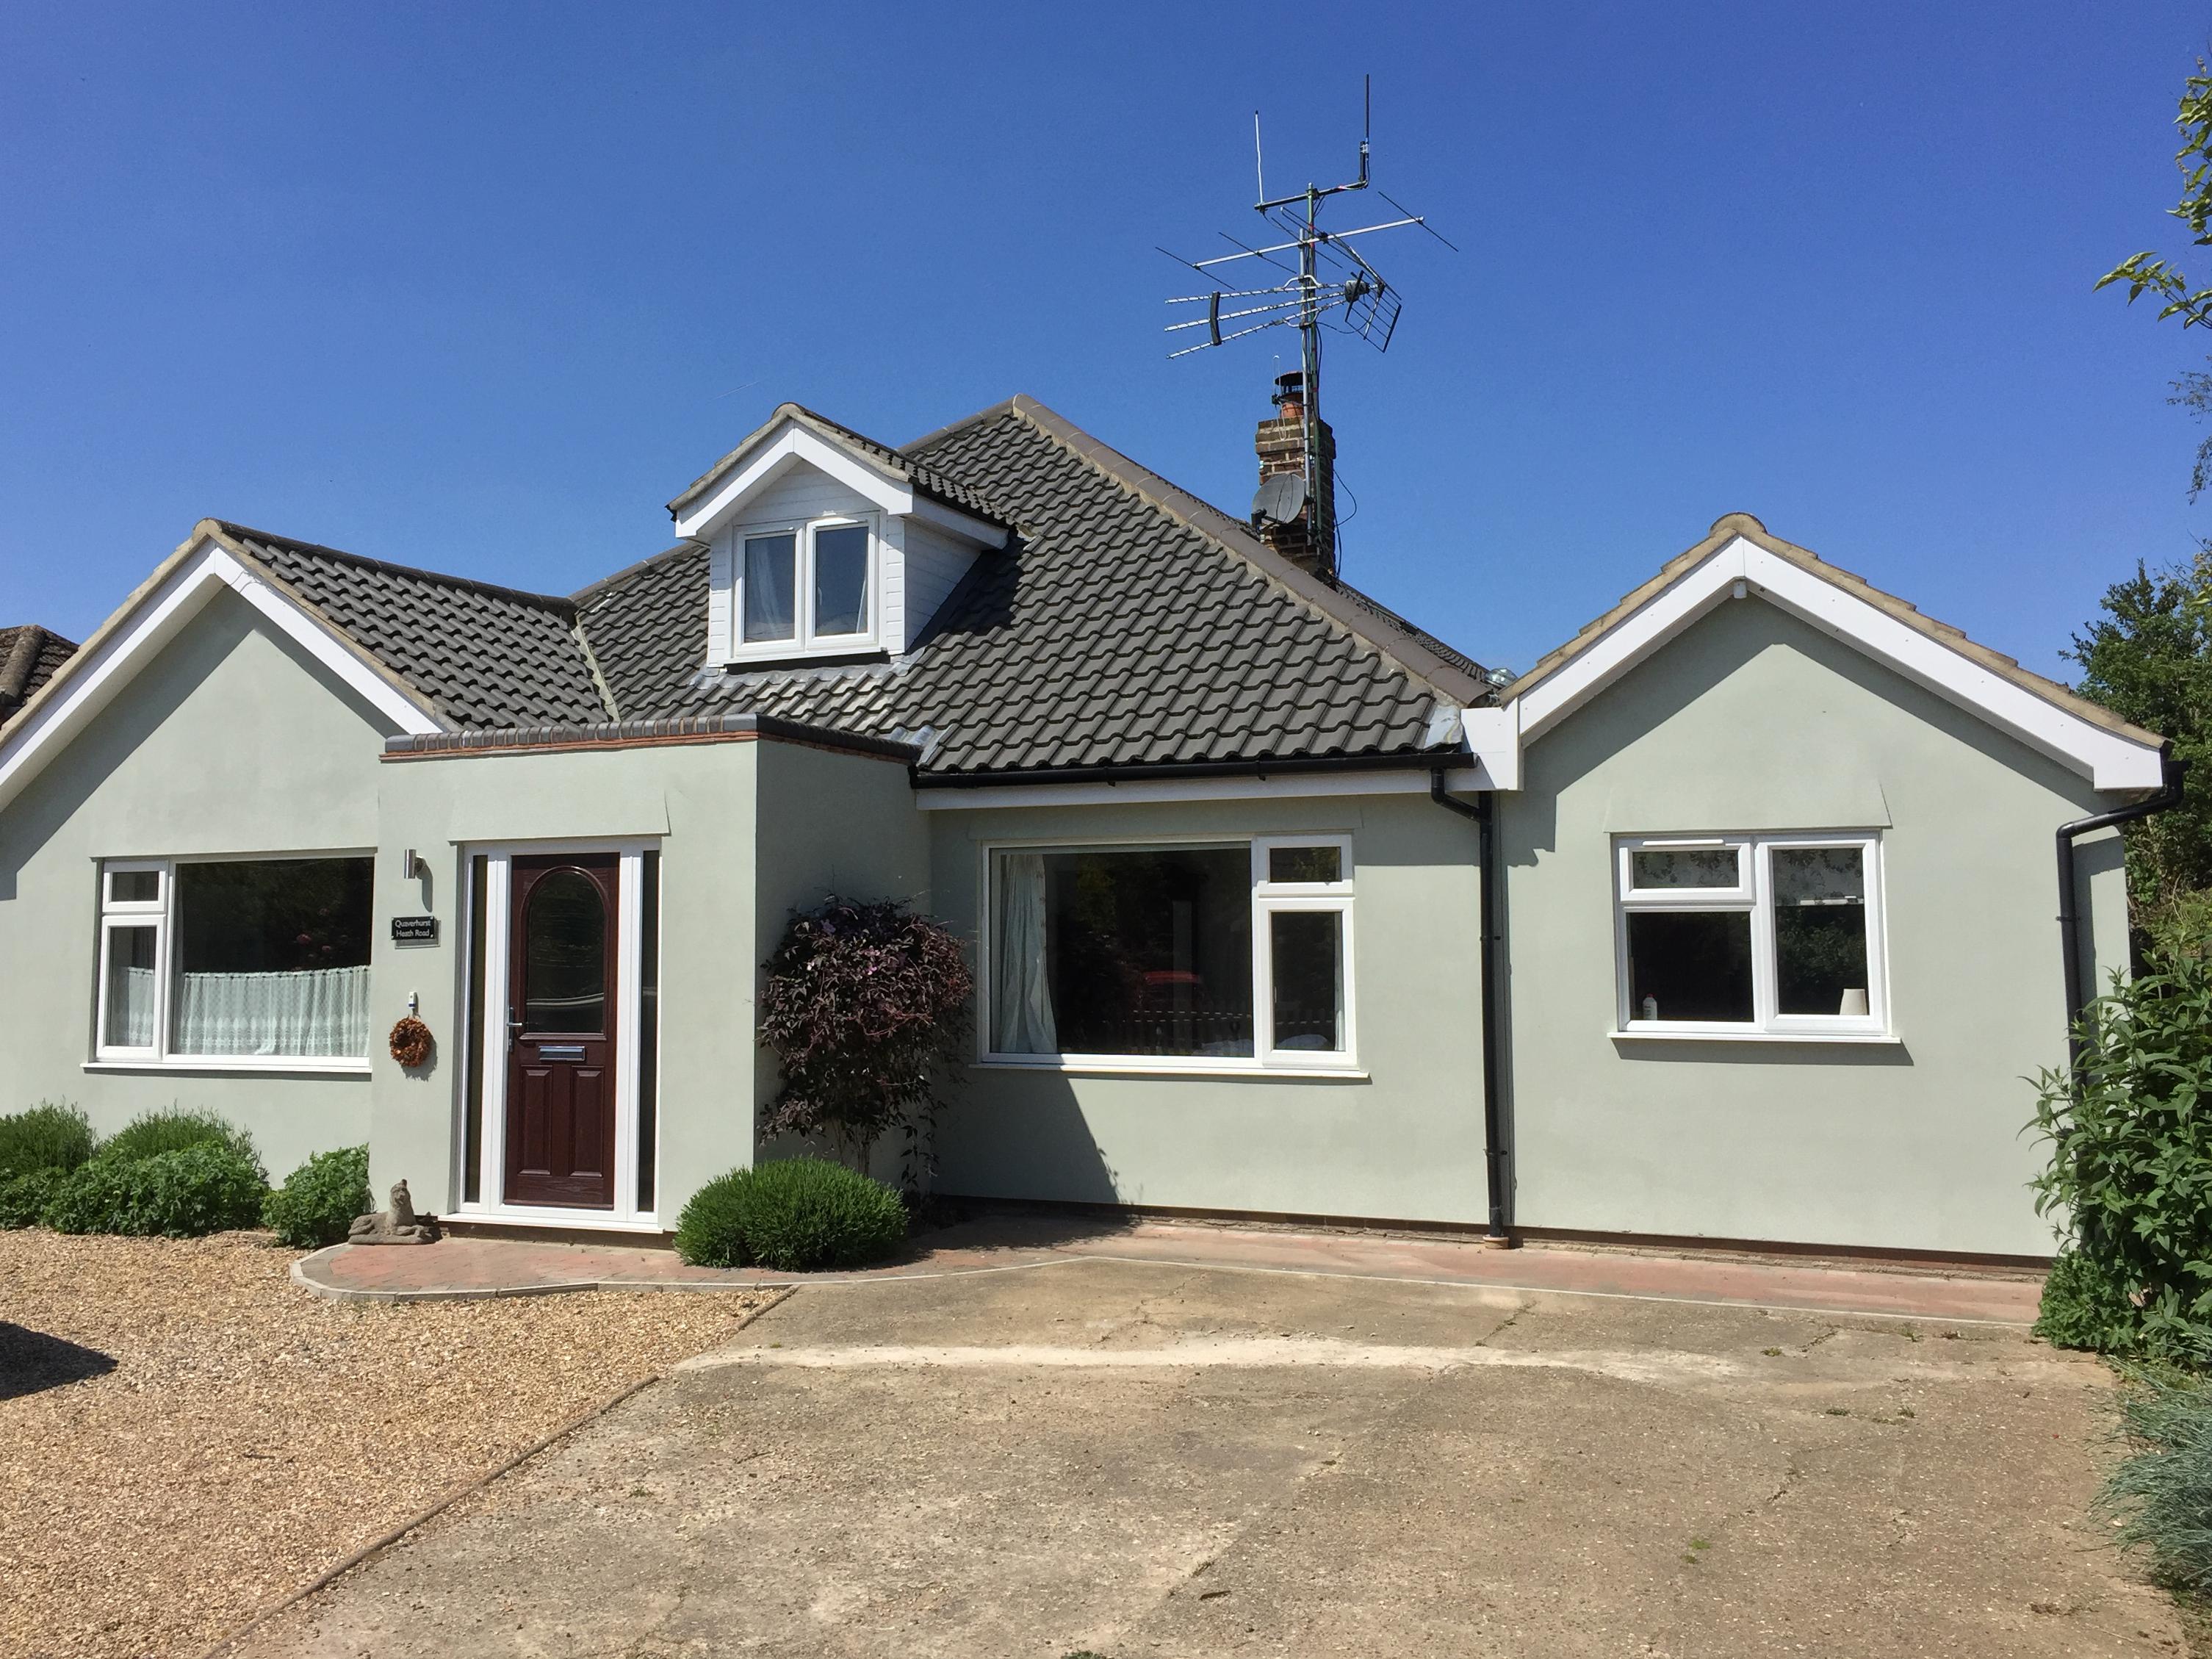 1 bedroom Cottage for rent in Stalham